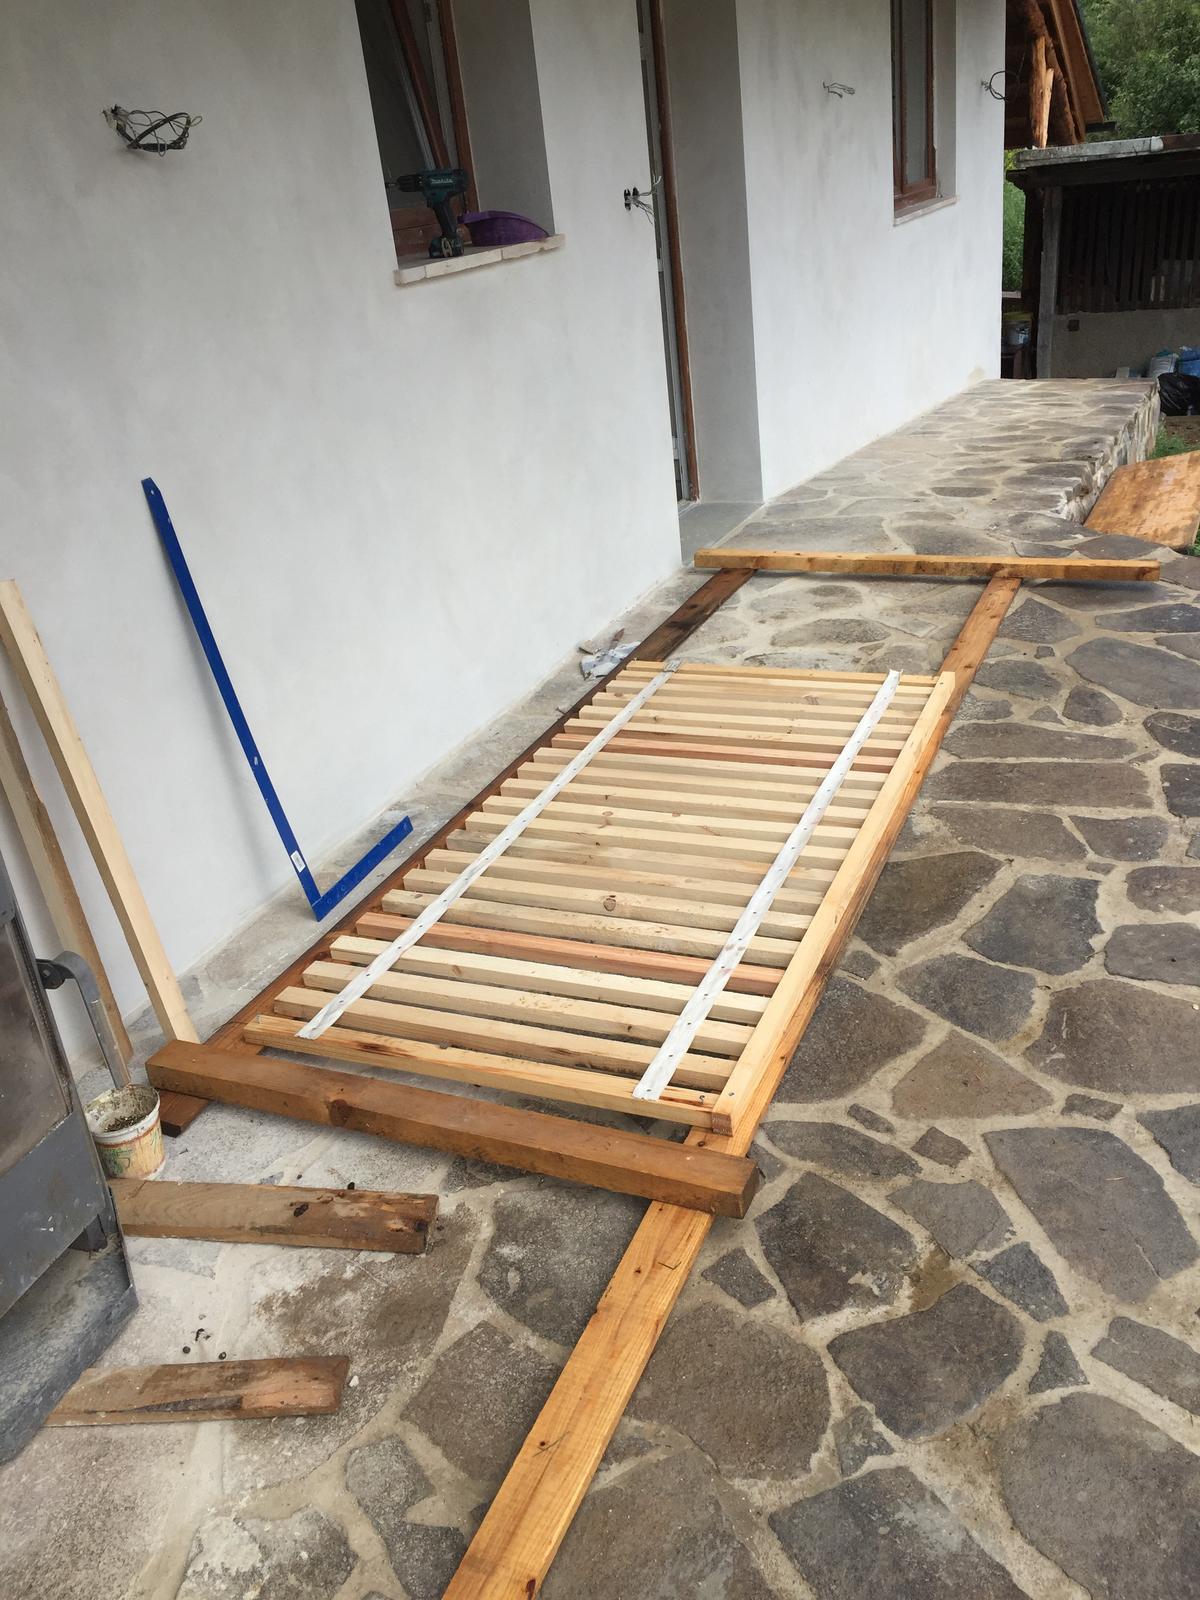 HACIENDA NAPOLI SEBECHLEBY - Pripravok na vyrobu rostov na postele